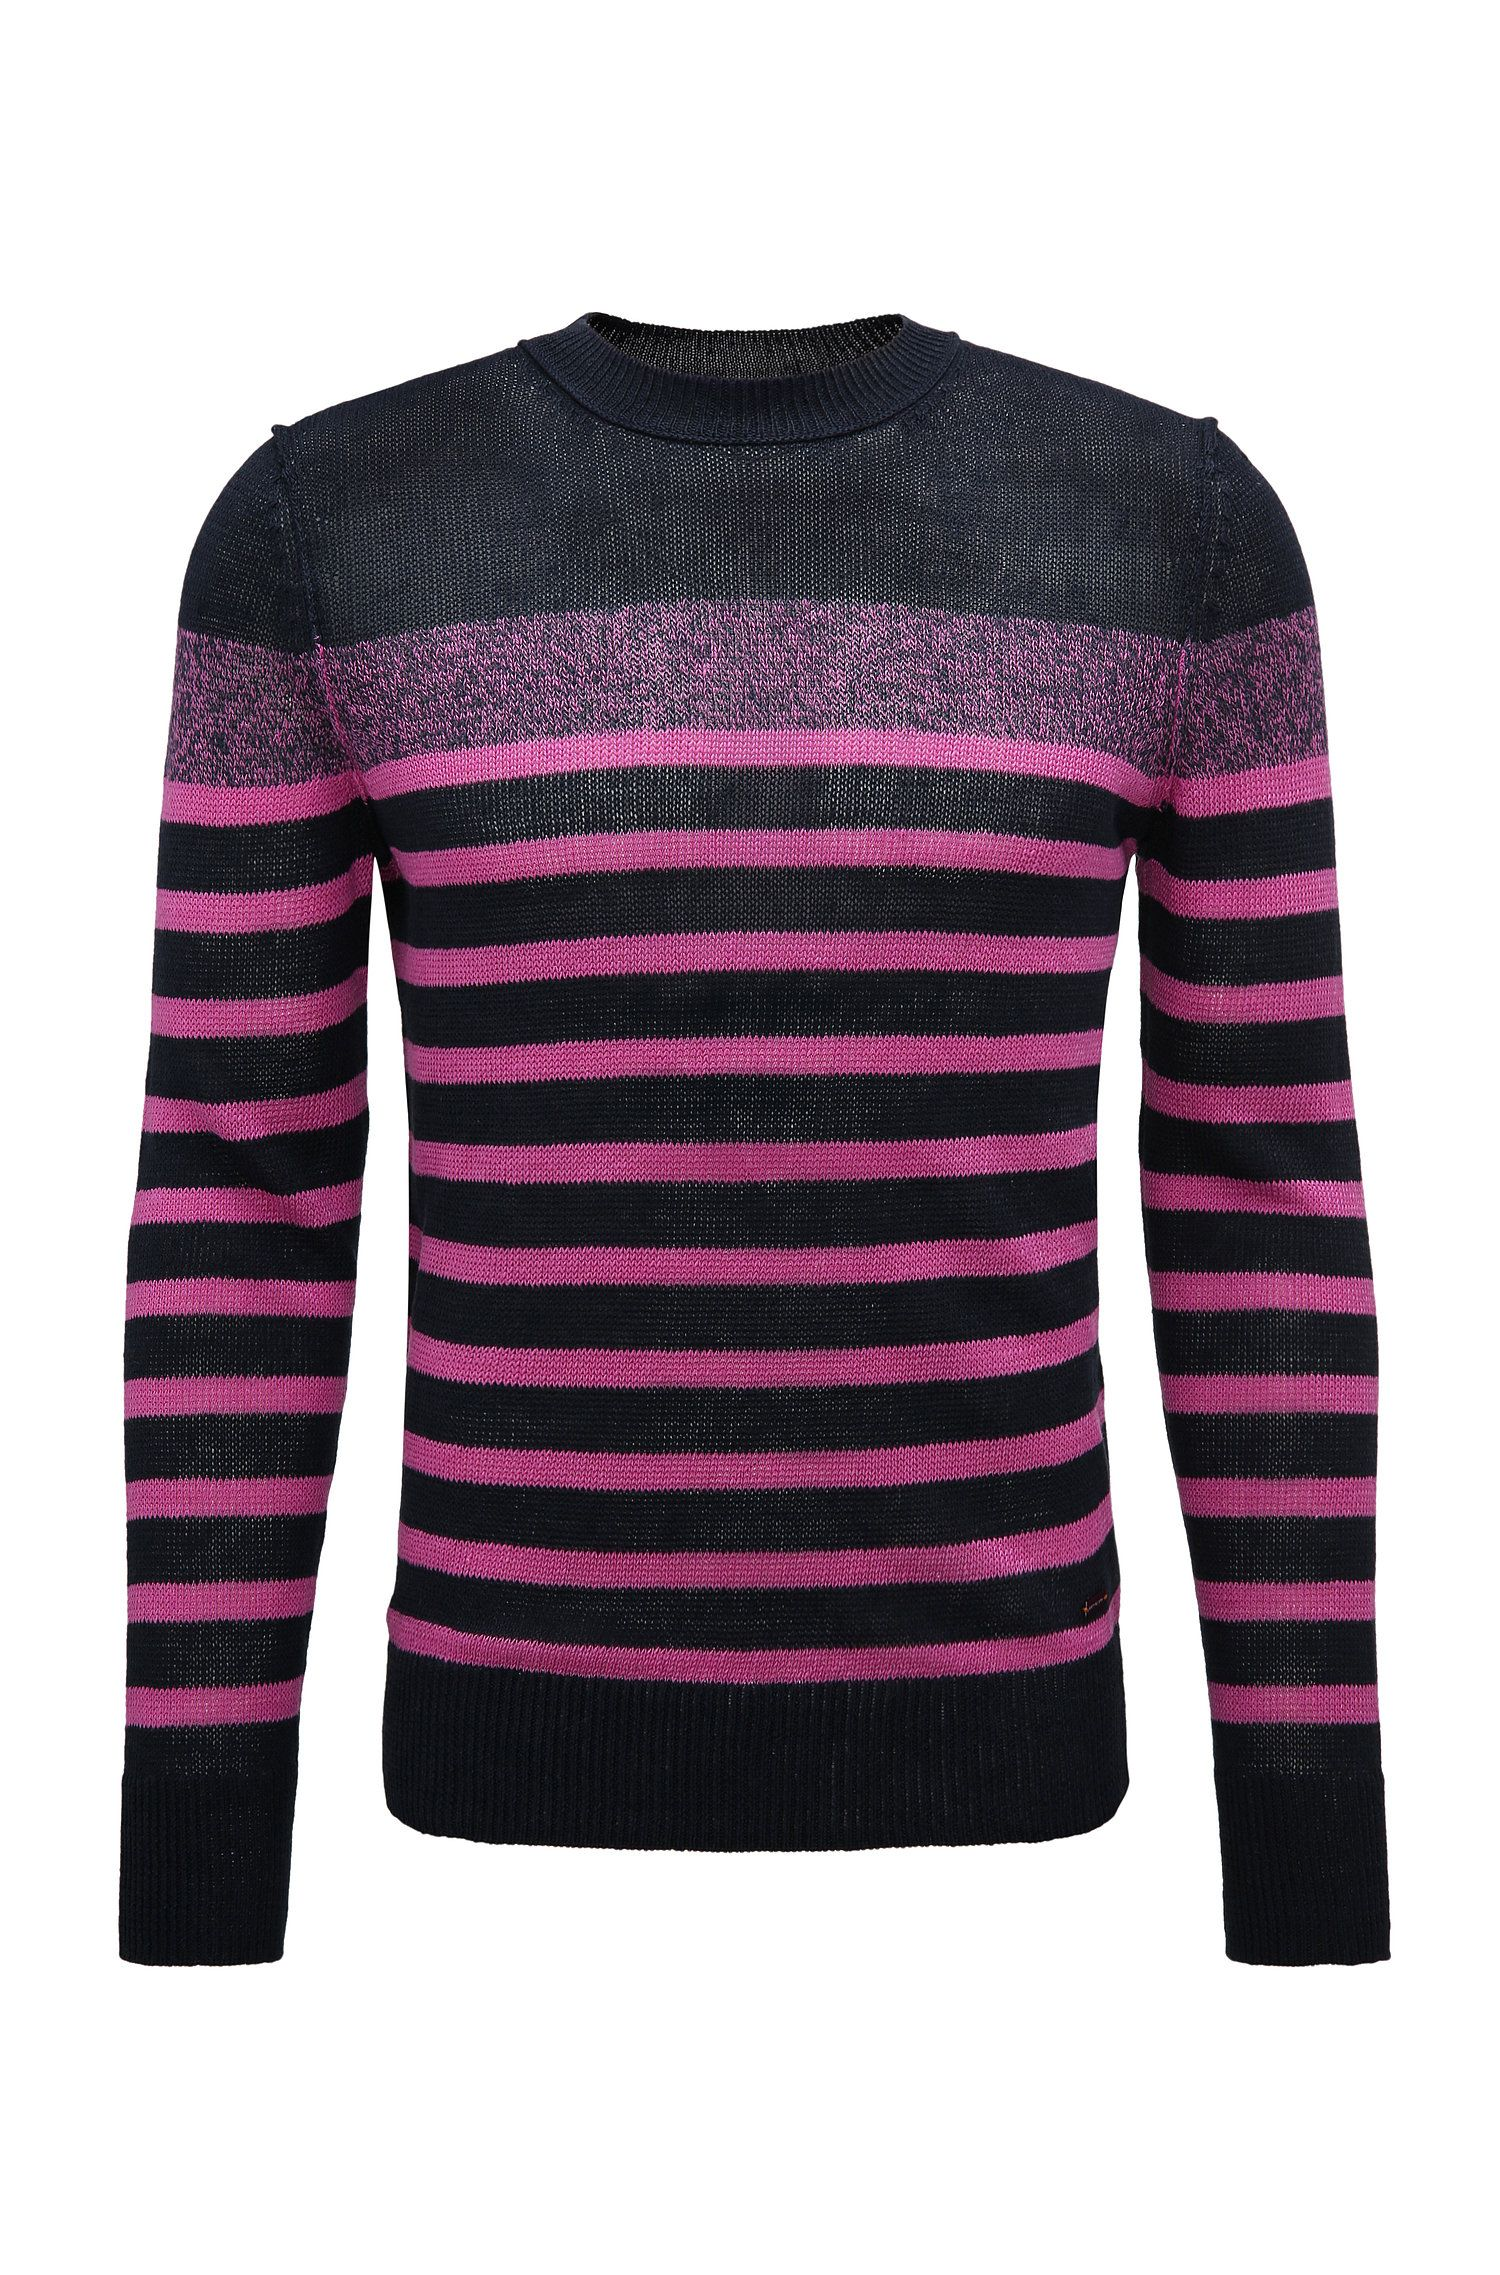 'Krew' | Striped Linen Sweater, Pink